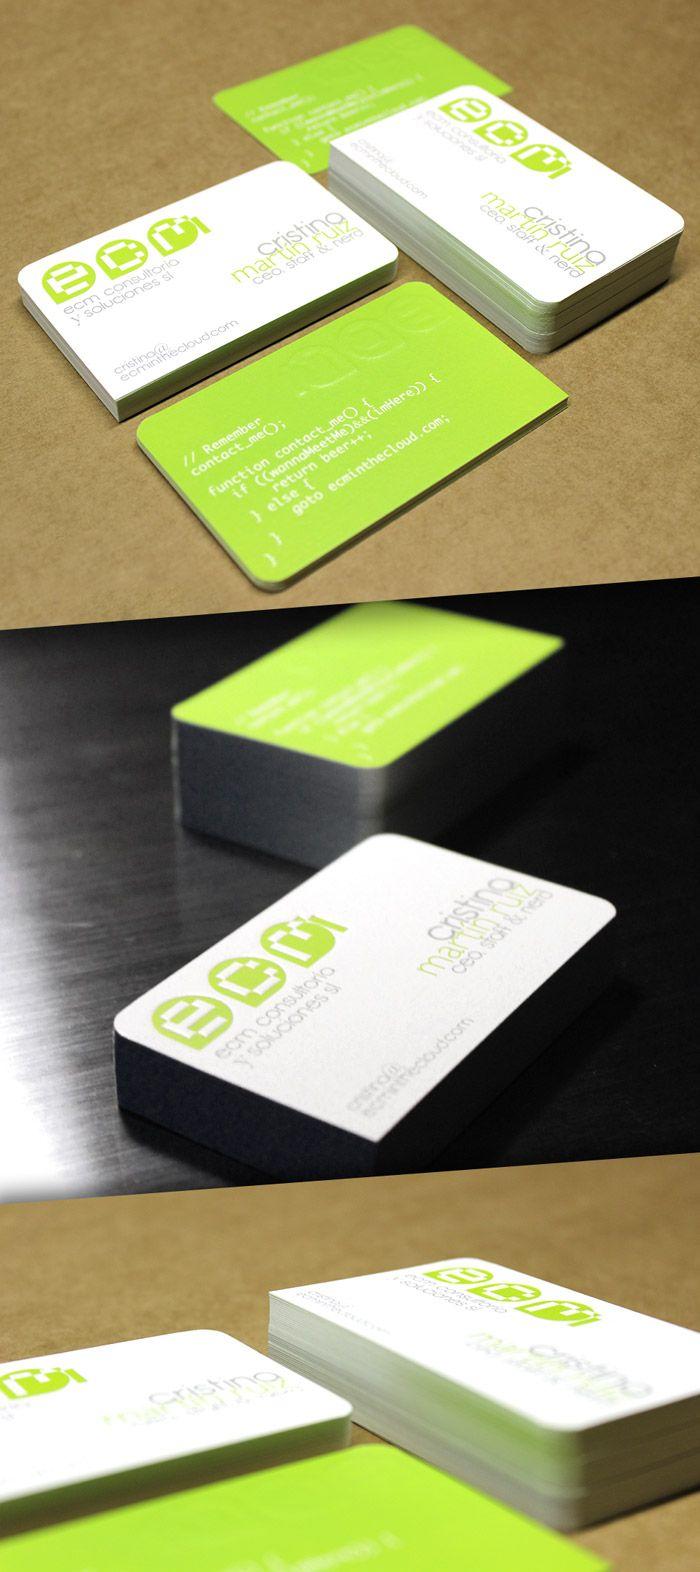 Tarjetas de visita a 3 tintas, doble cara, golpe seco y 3 esquinas de 4 redondeadas // business cards #offset #roundedcorners #letterpress